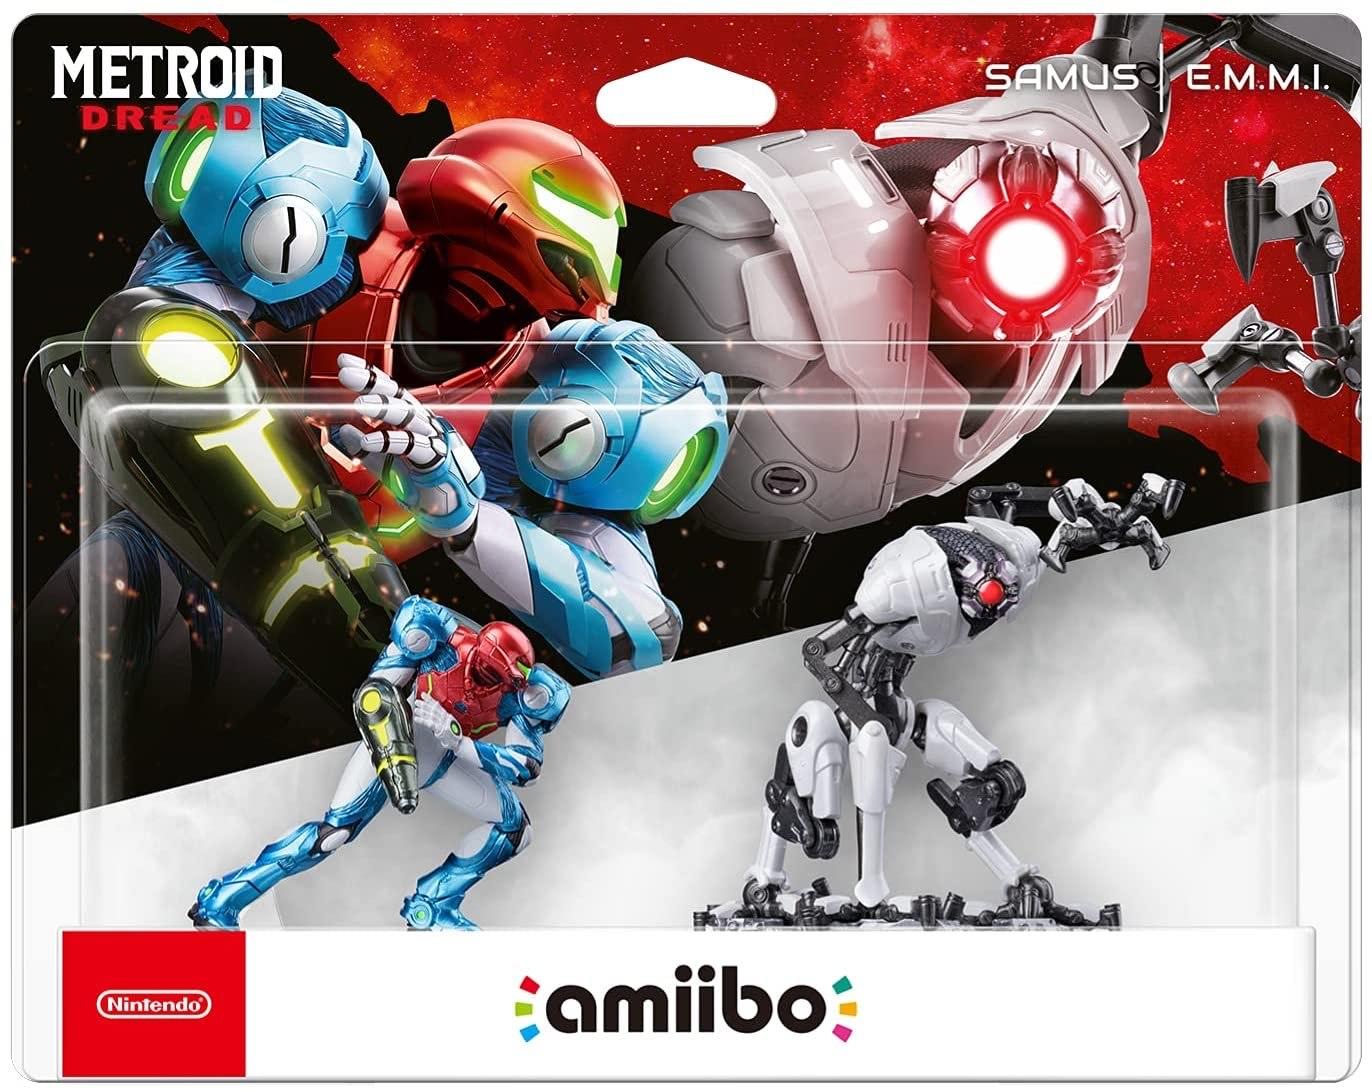 Metroid Dread Samus/E.M.M.I. Amiibo 2-Pack £25.99 (pre-order) at Amazon